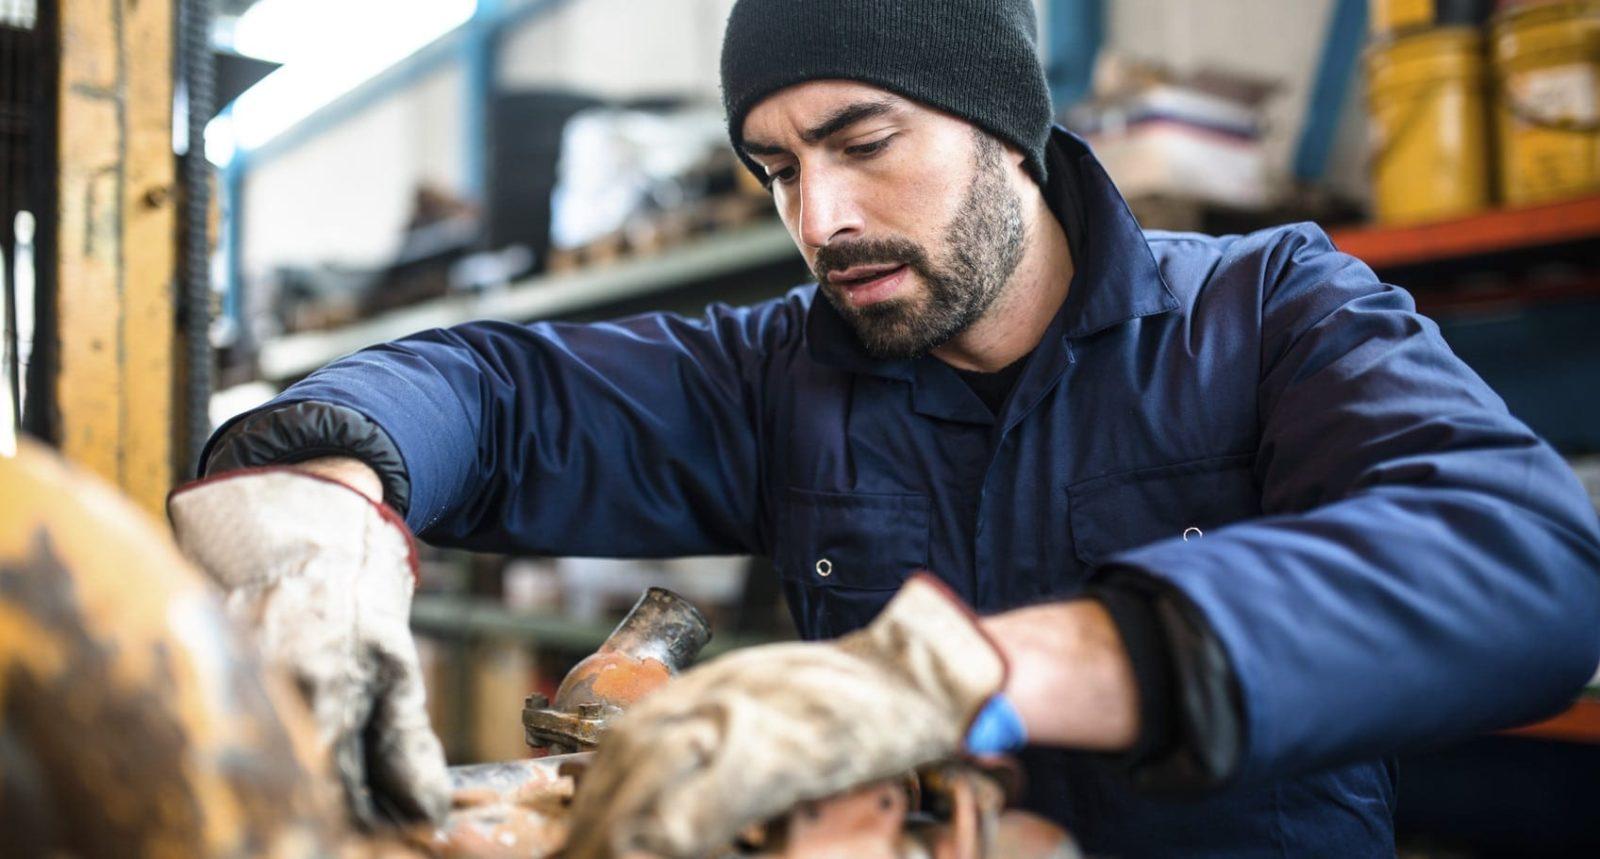 Mechanic Working In An Auto Body Shop Stock Photo